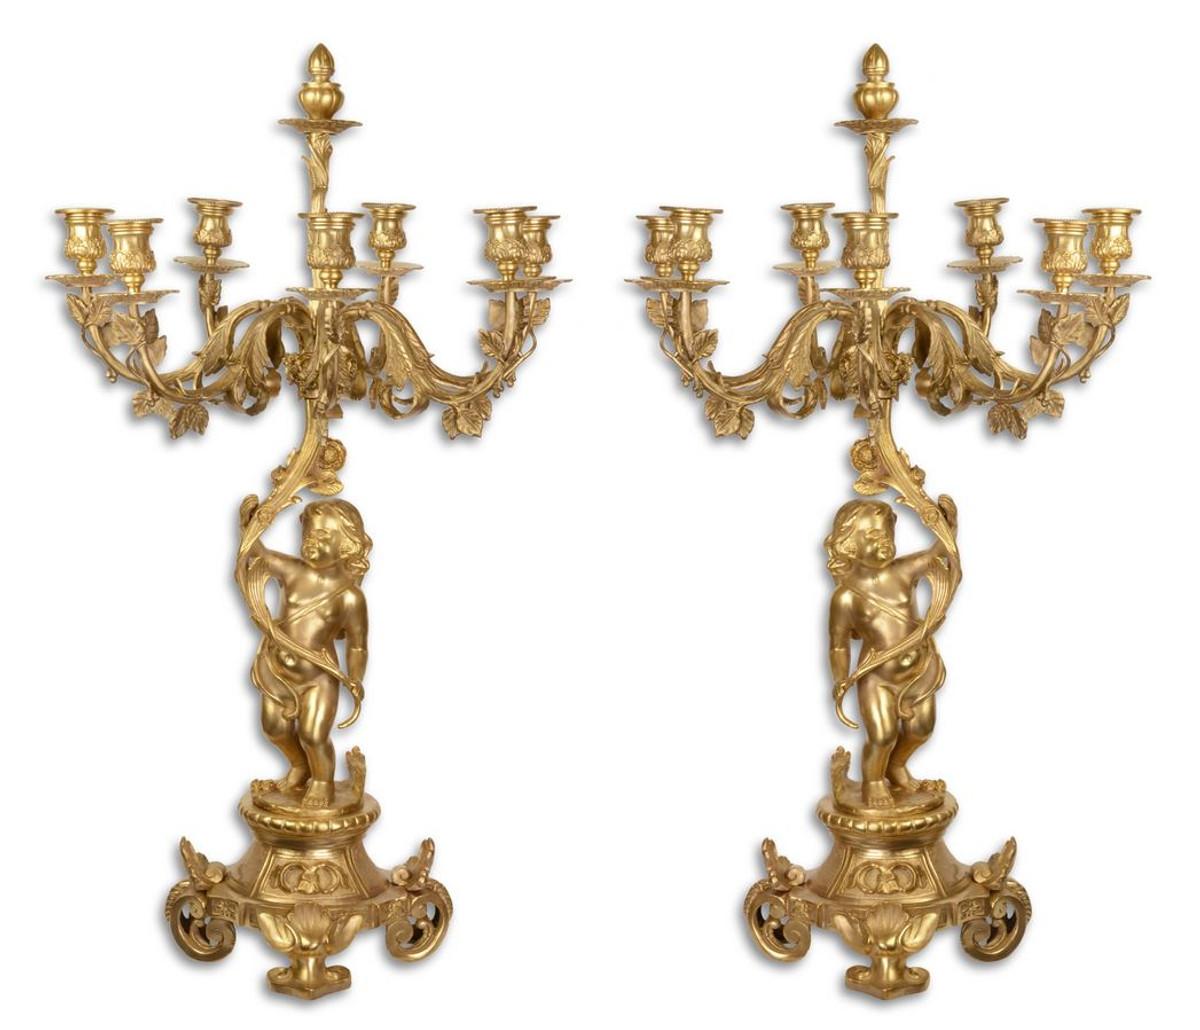 Casa Padrino Barock Kerzenständer Set Gold 46 x 46 x H. 83 cm - Edel & Prunkvoll 1